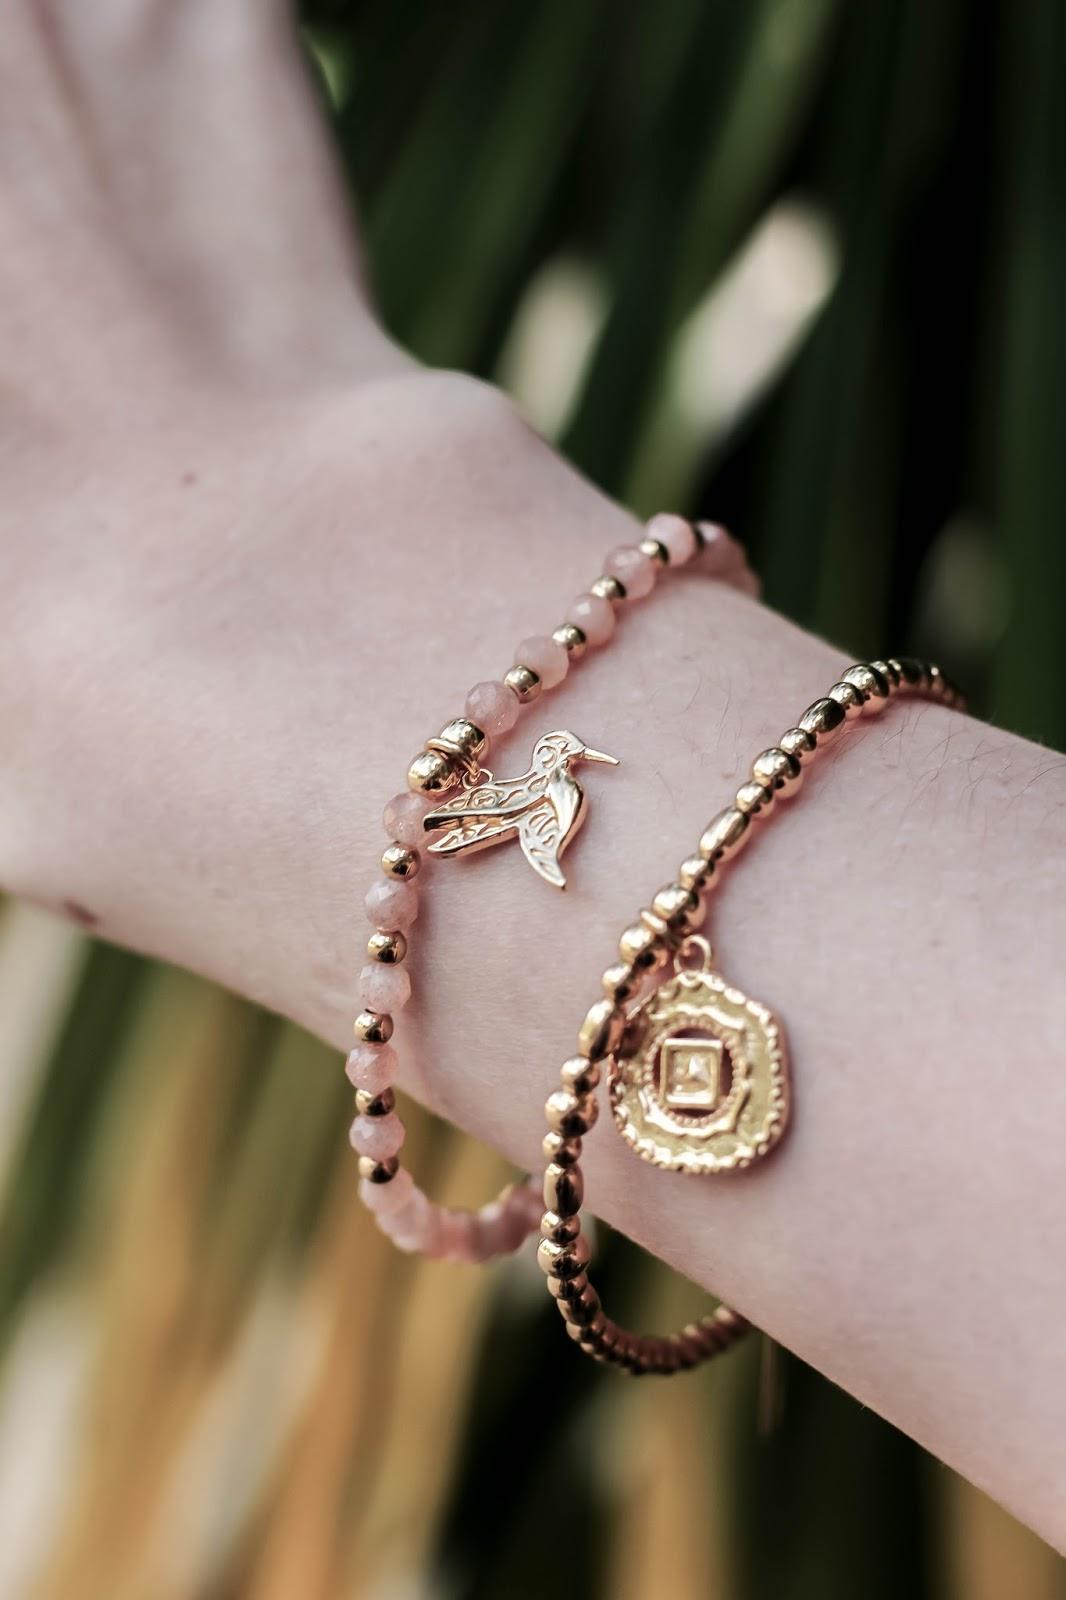 Chlobo Gold Cherabella Collection Blog Review